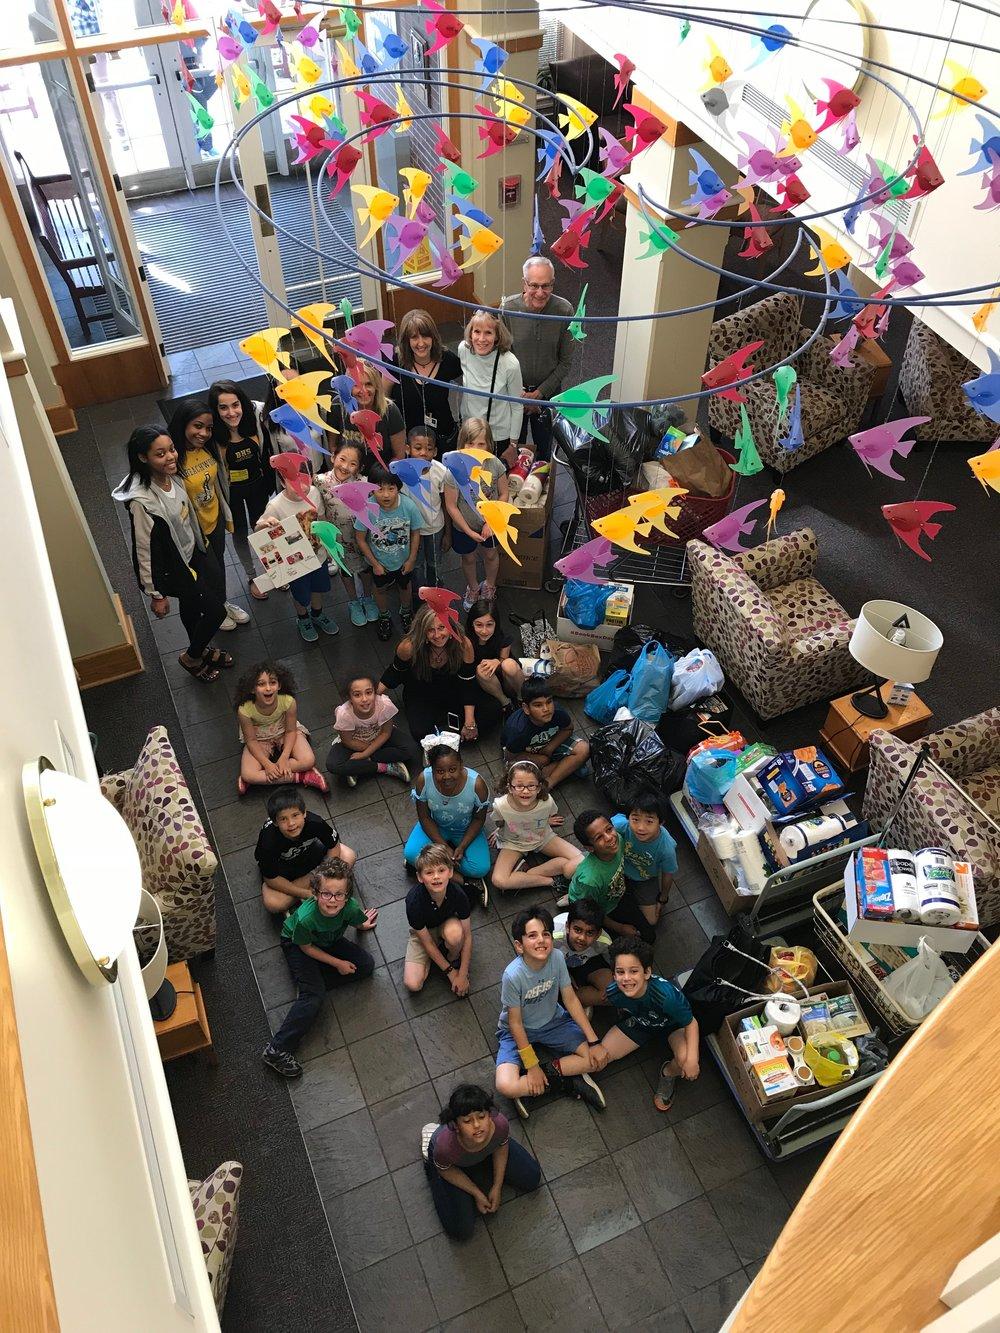 Beachwood Students - Wish List Items - 5.18.18.jpg